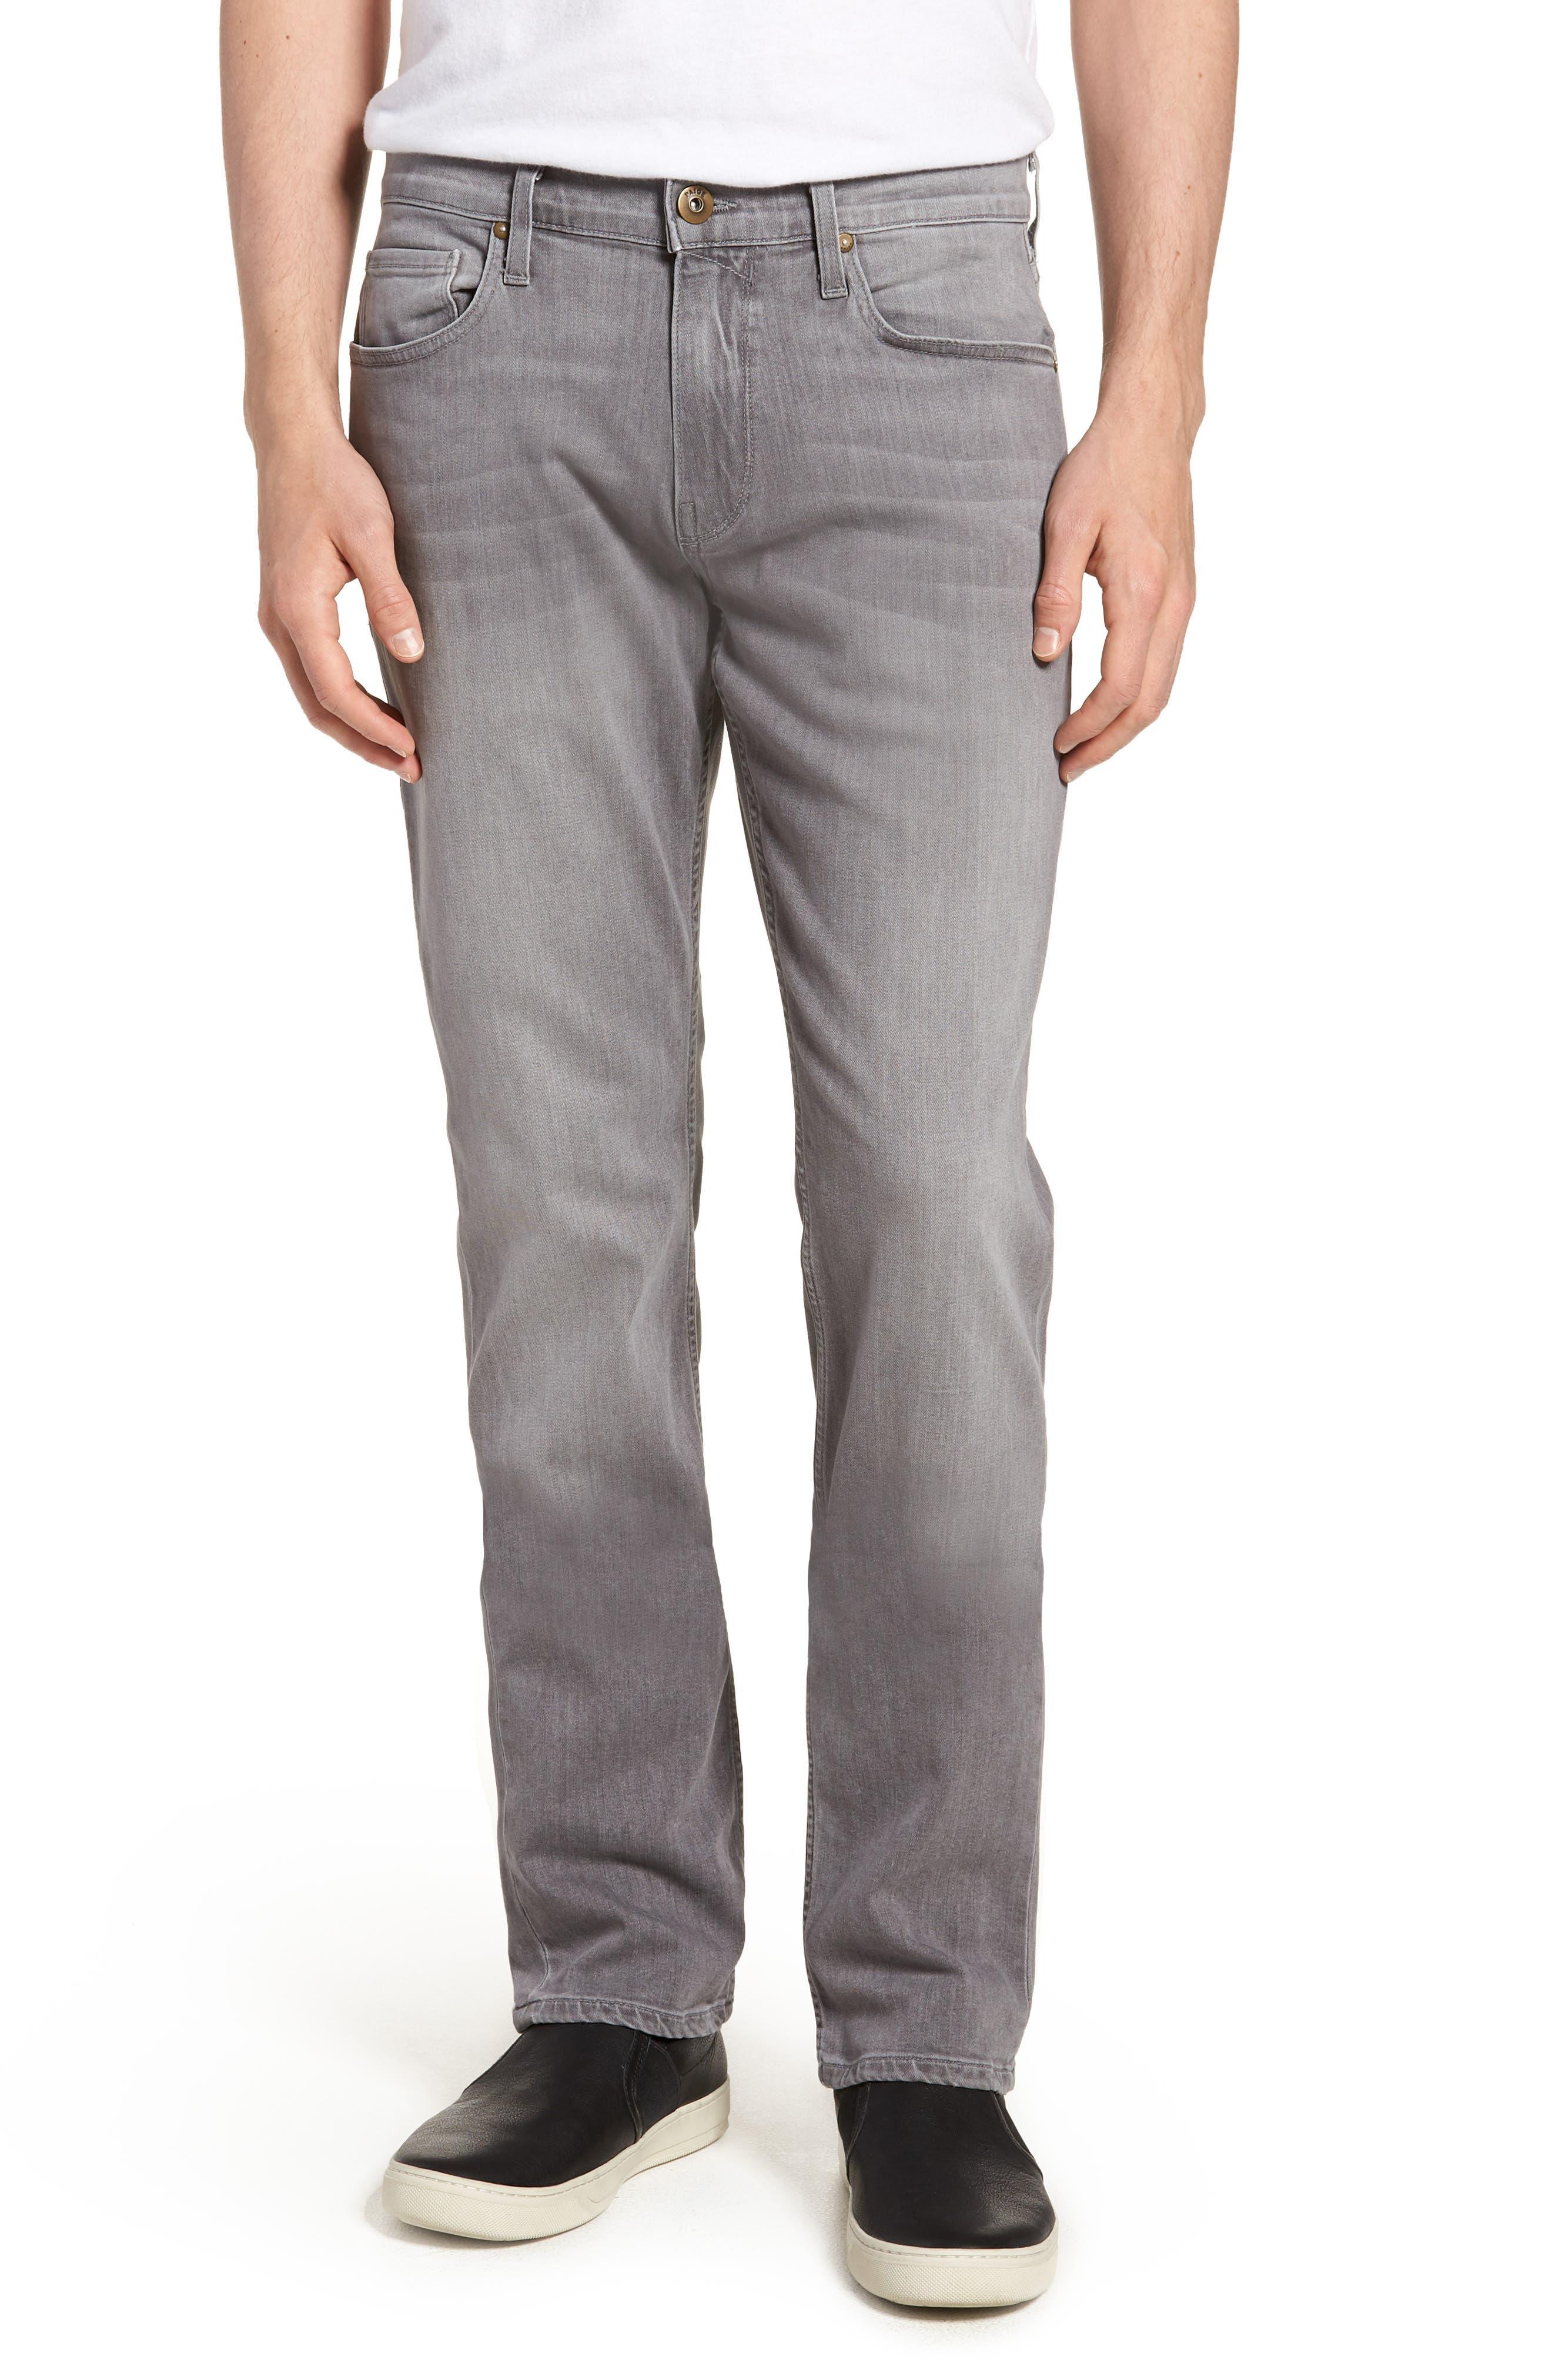 PAIGE Federal Slim Straight Leg Jeans (Annex)